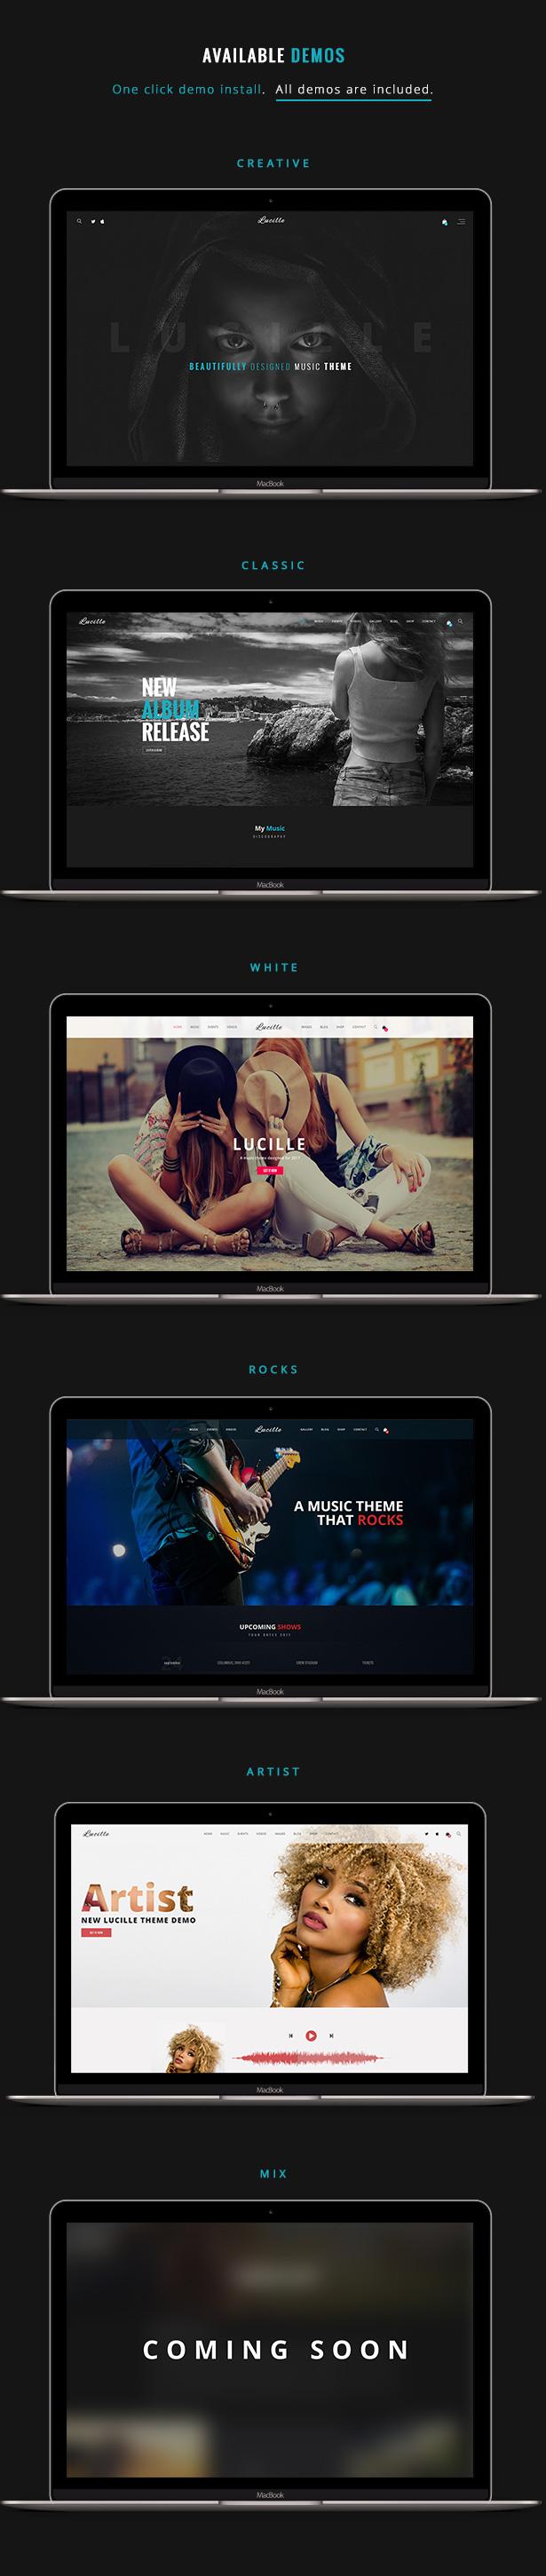 Lucille Music WordPress Theme Demos